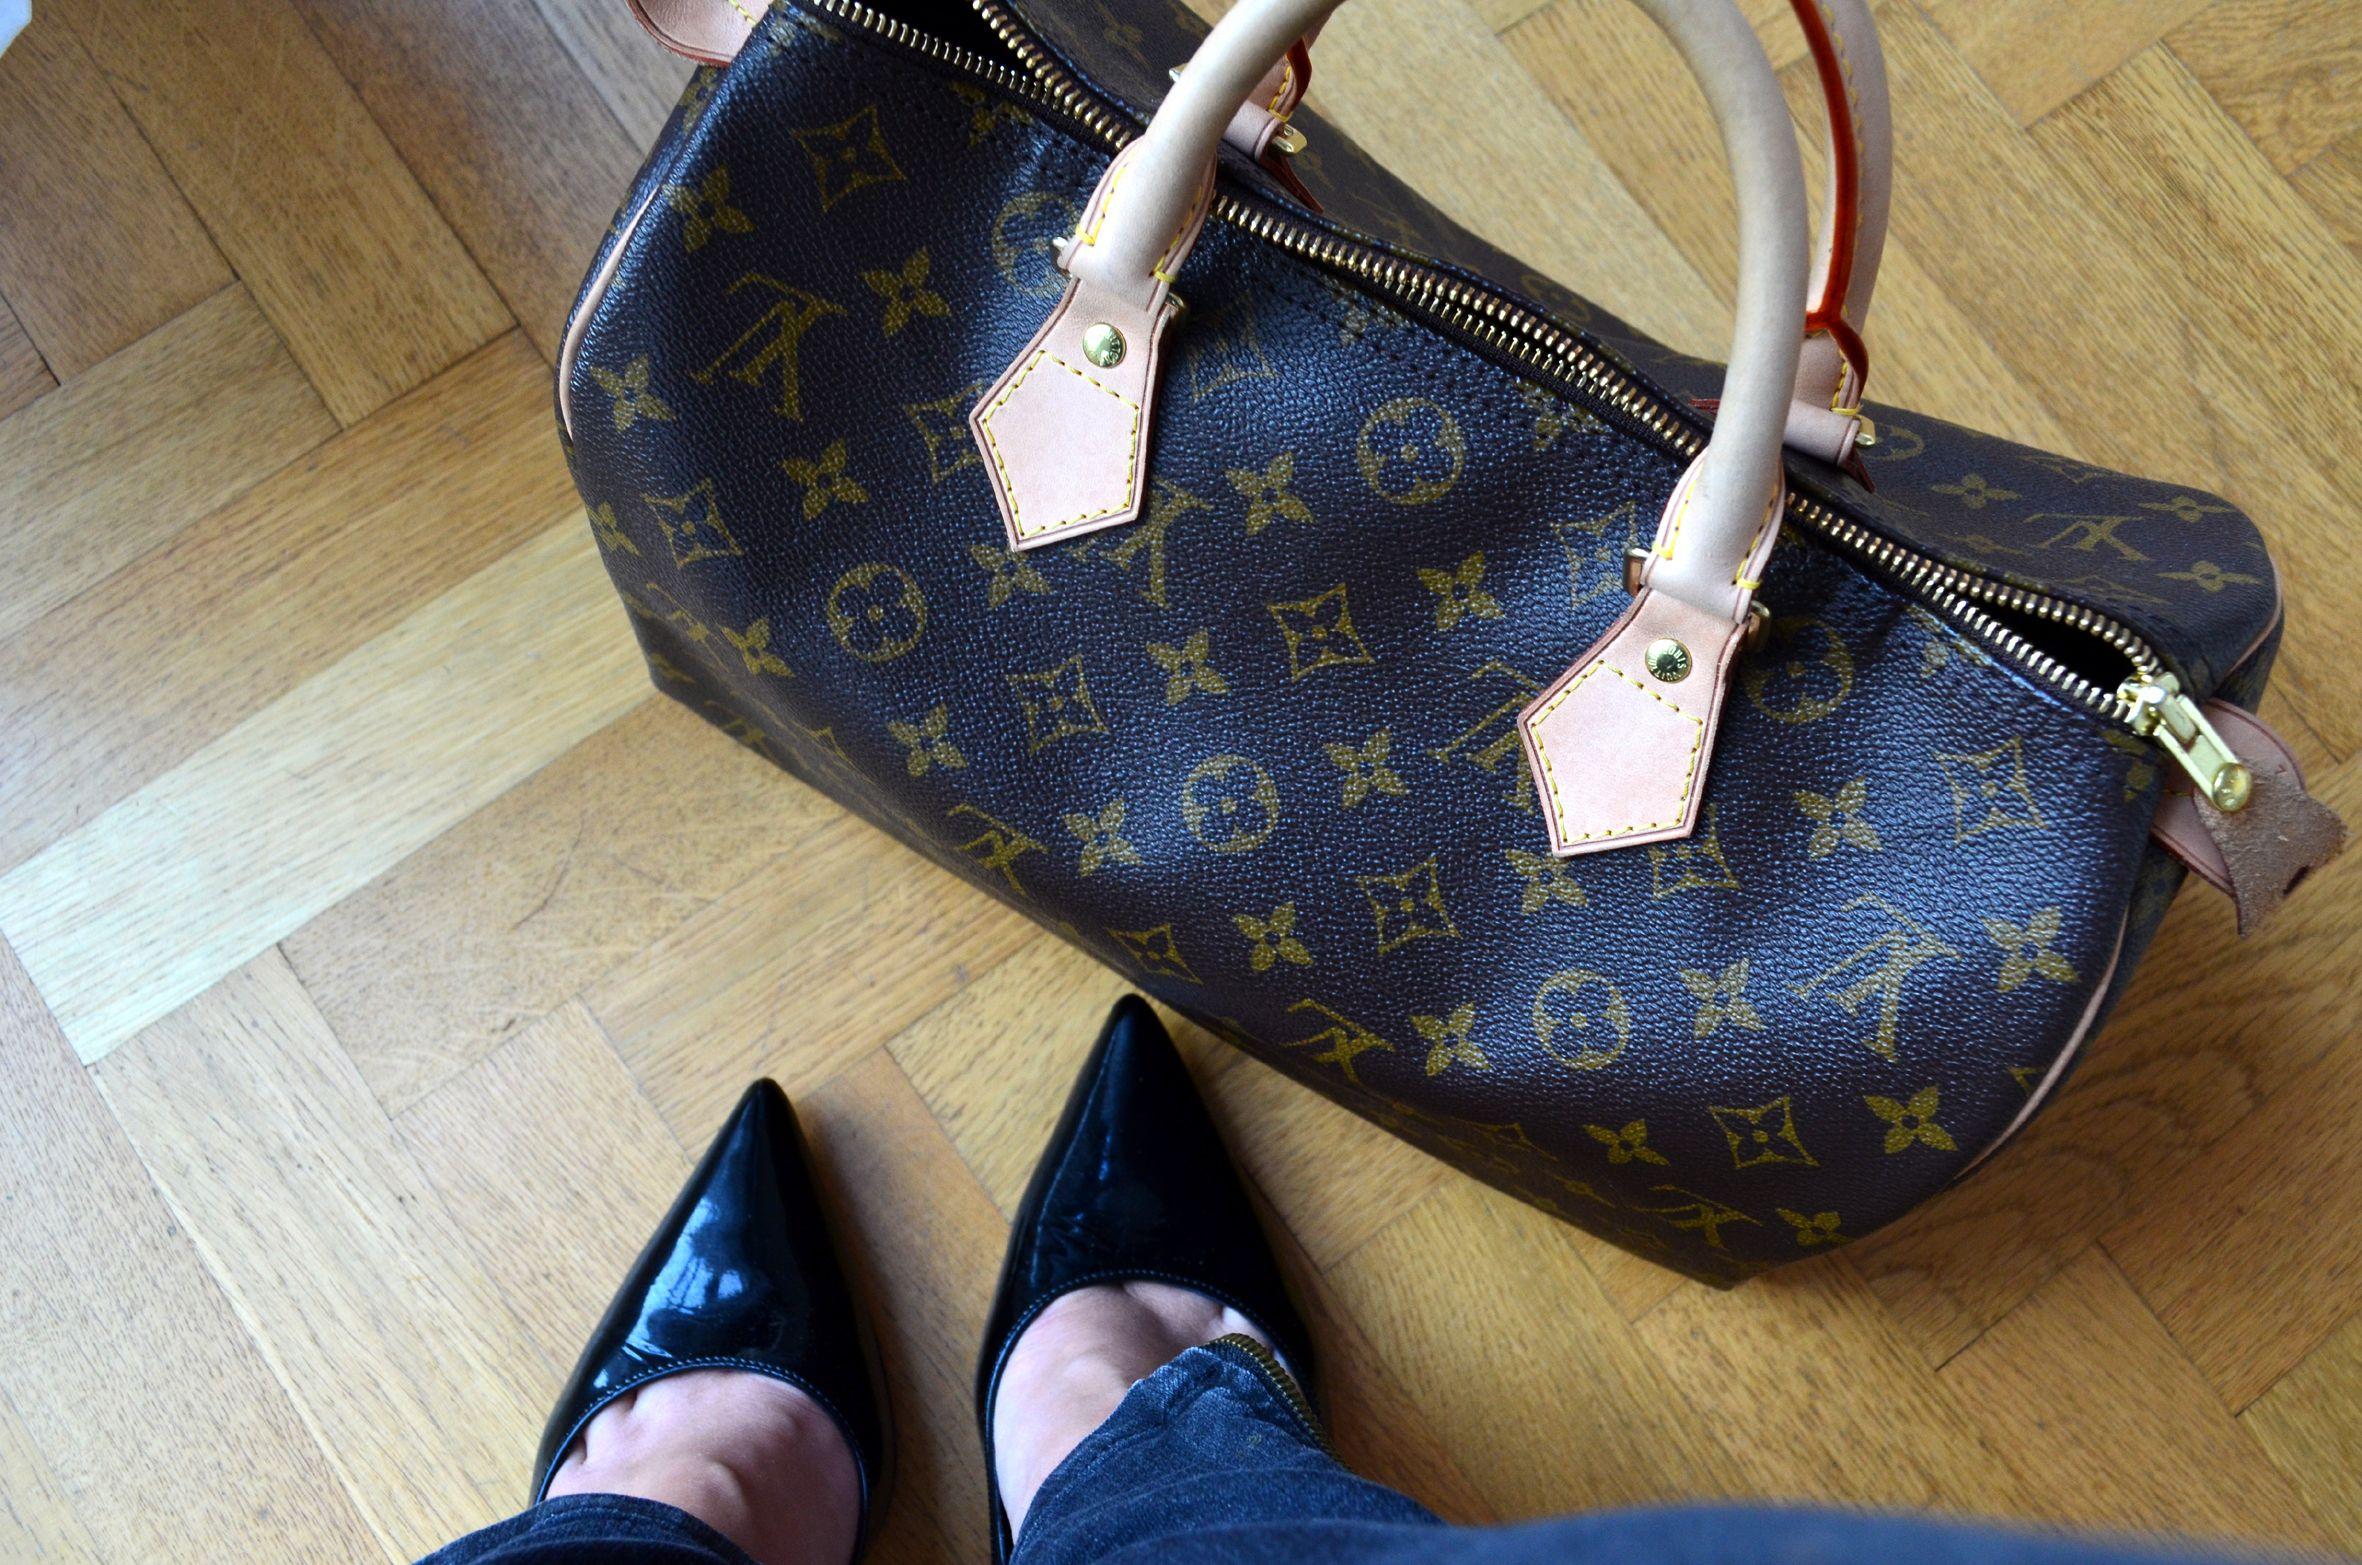 Sac-Louis-Vuitton.jpg 2362×1565 pixels